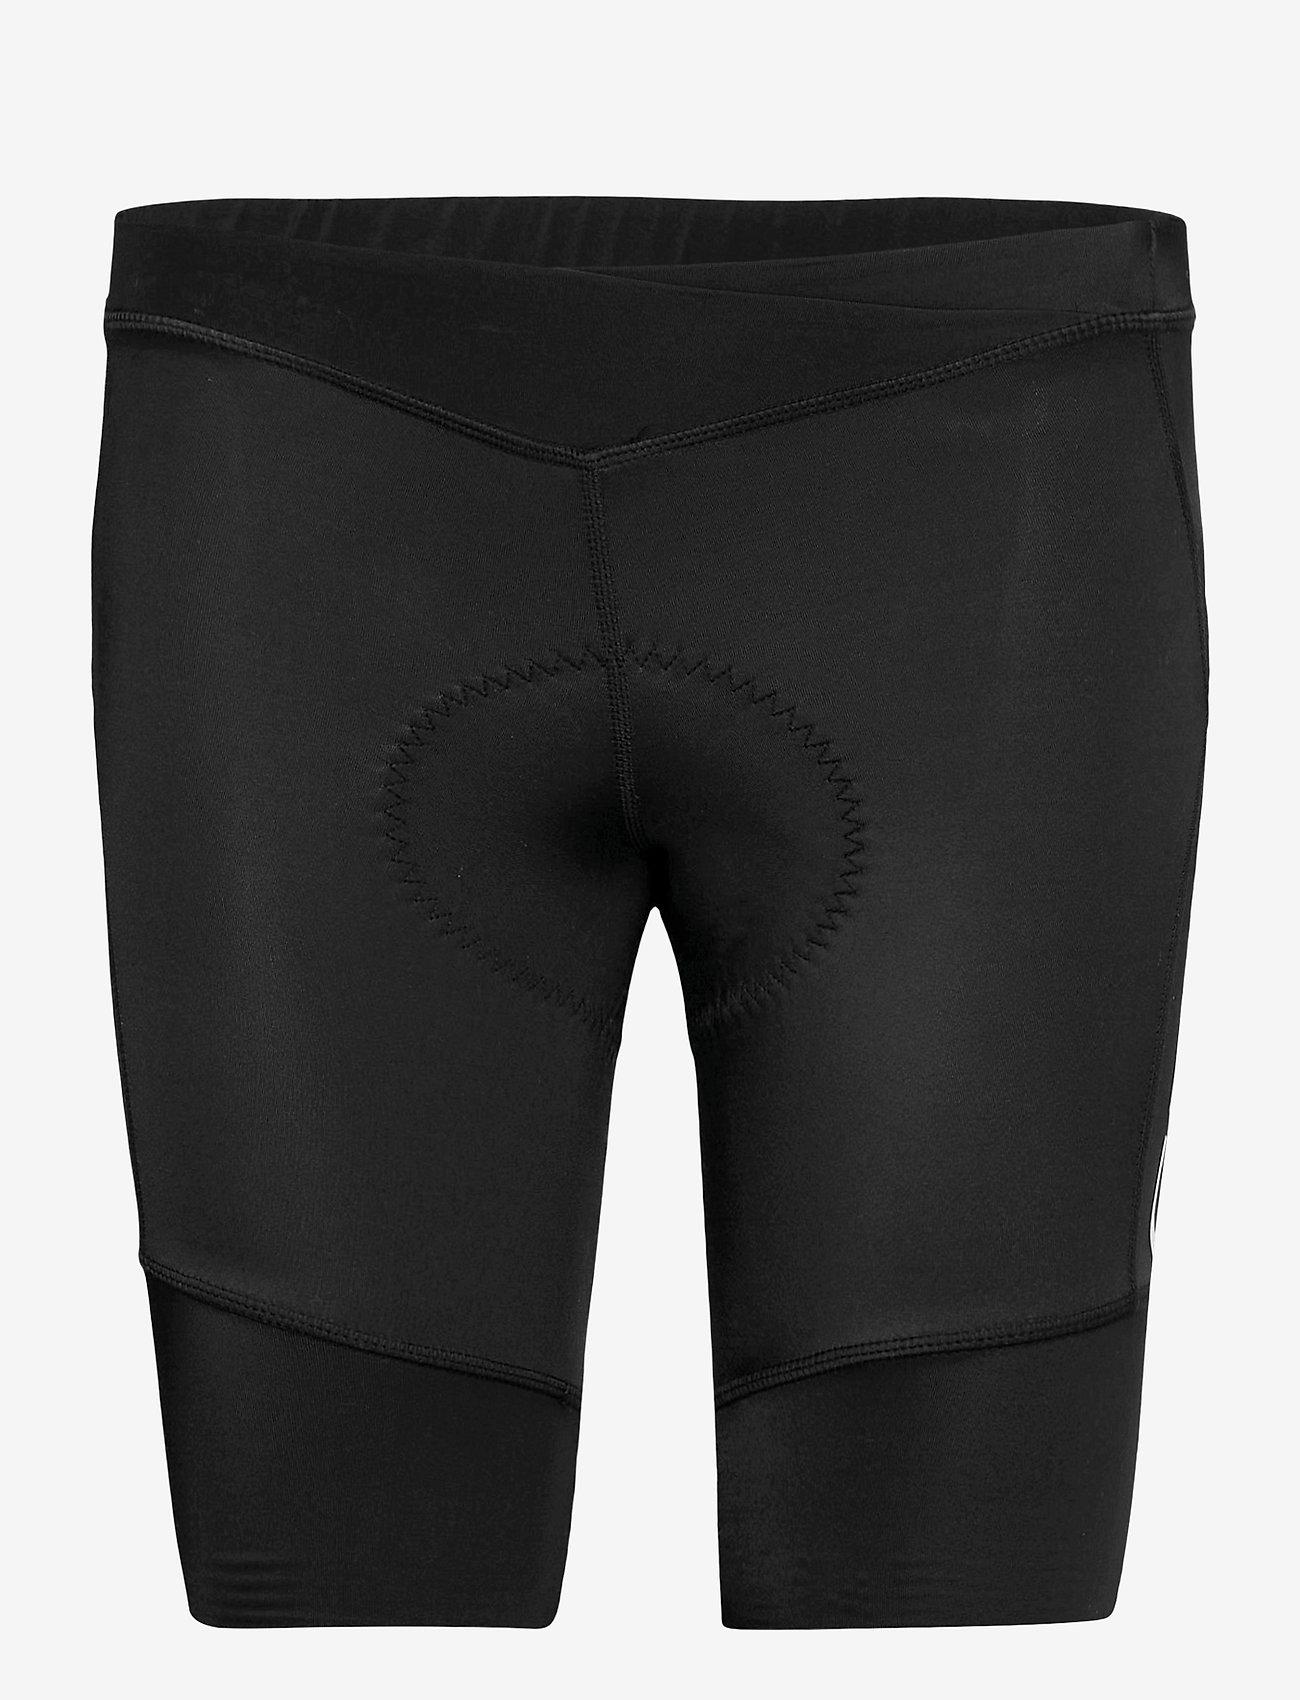 Craft - Essence Shorts W - sykkelshorts og tights - black - 0